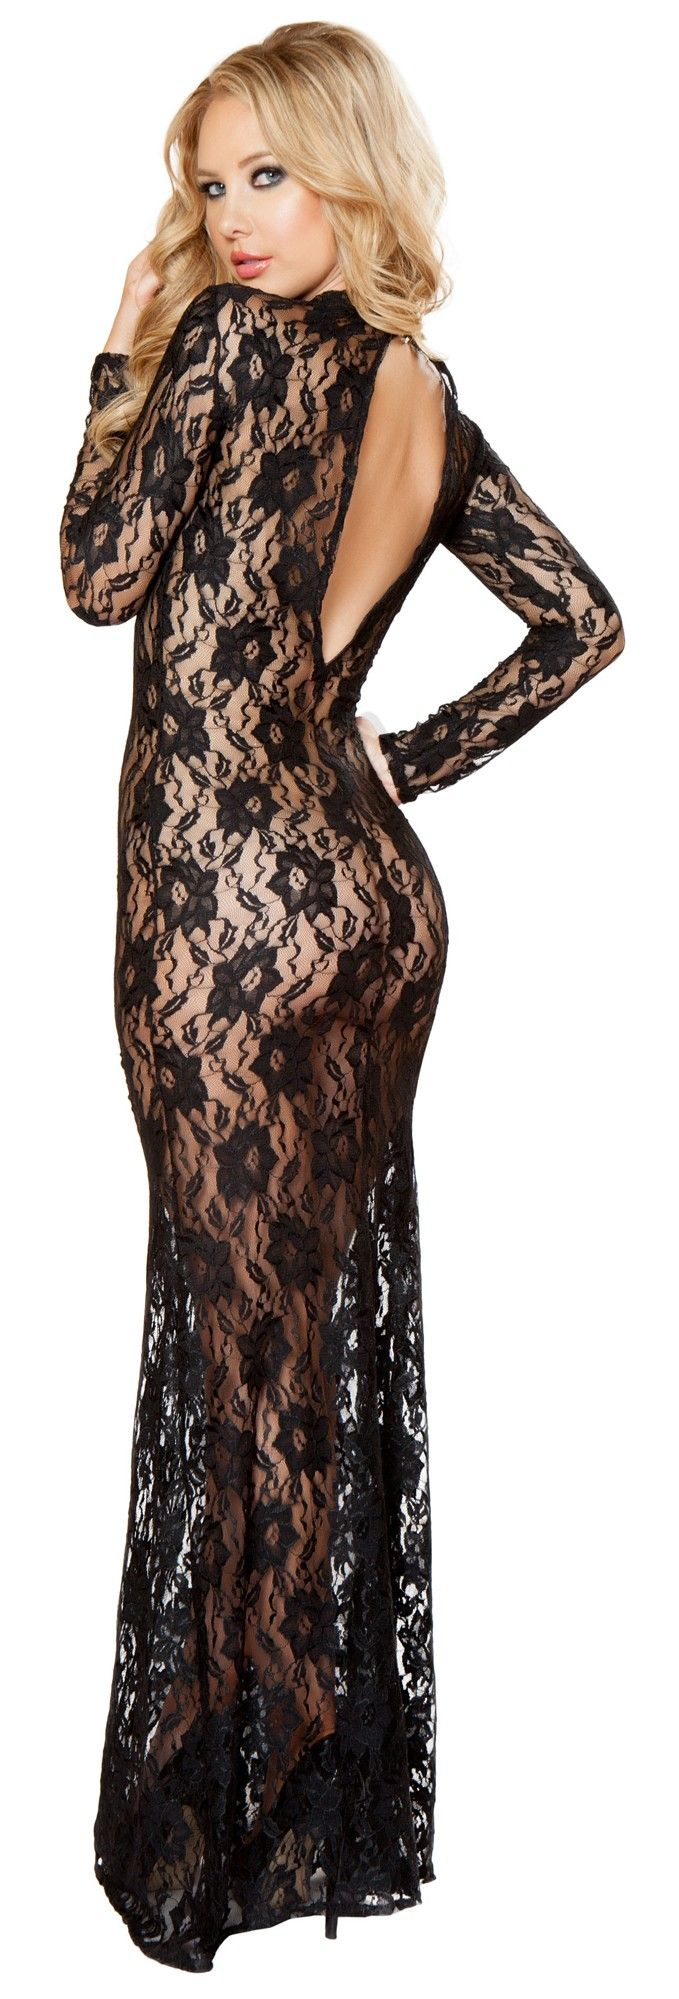 Open back lace lingerie dress rmli back beautiful gowns